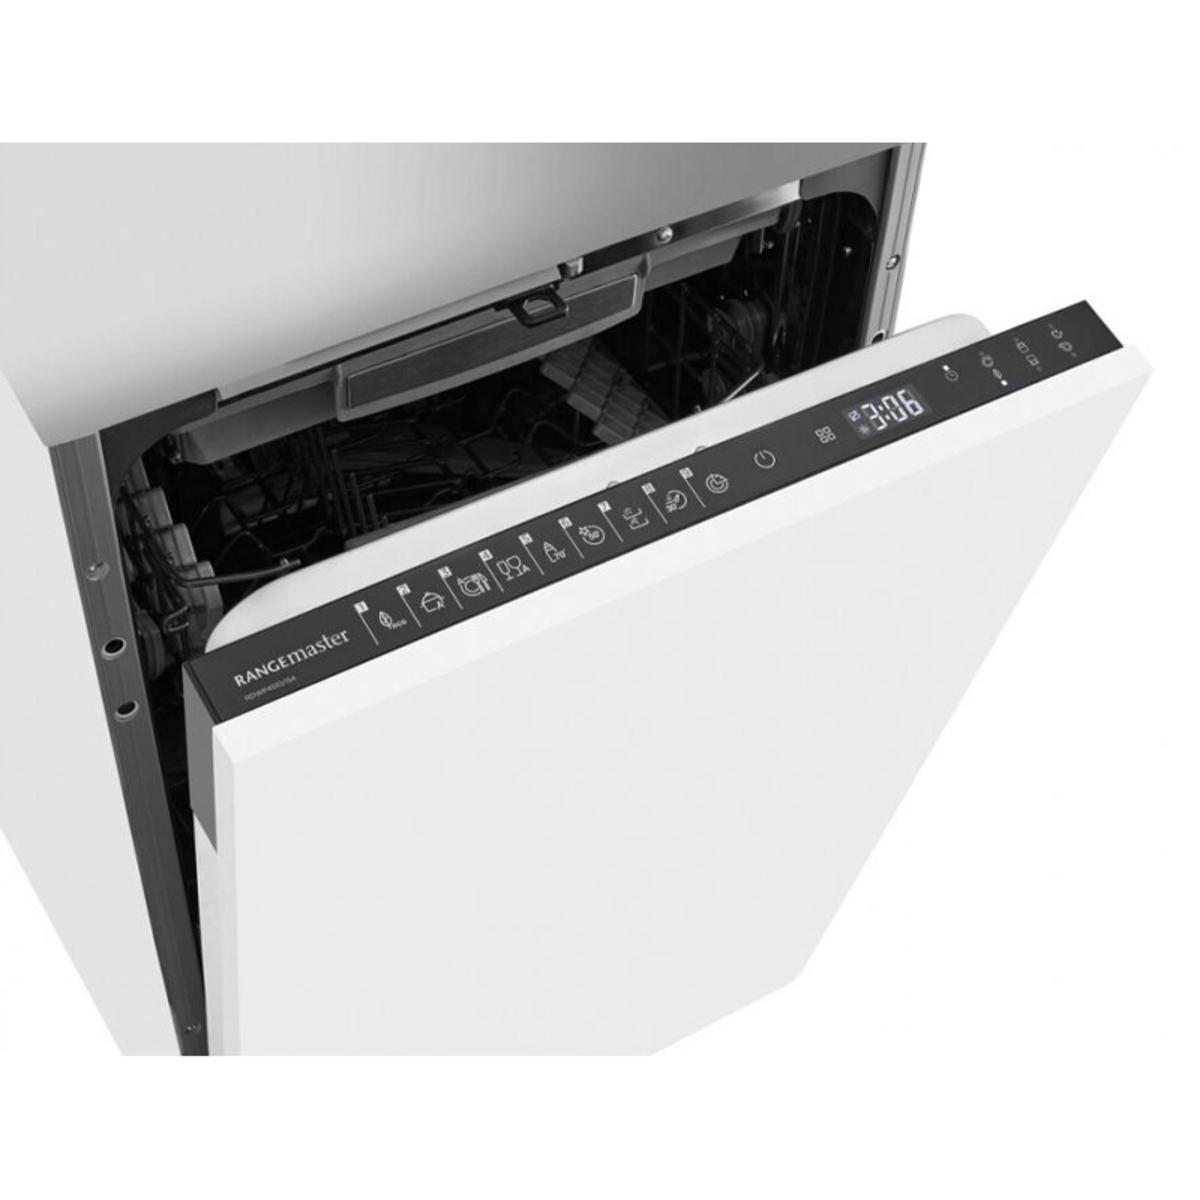 Rangemaster RDWP4510/I54 P45 Premium Integrated 45cm Dishwasher